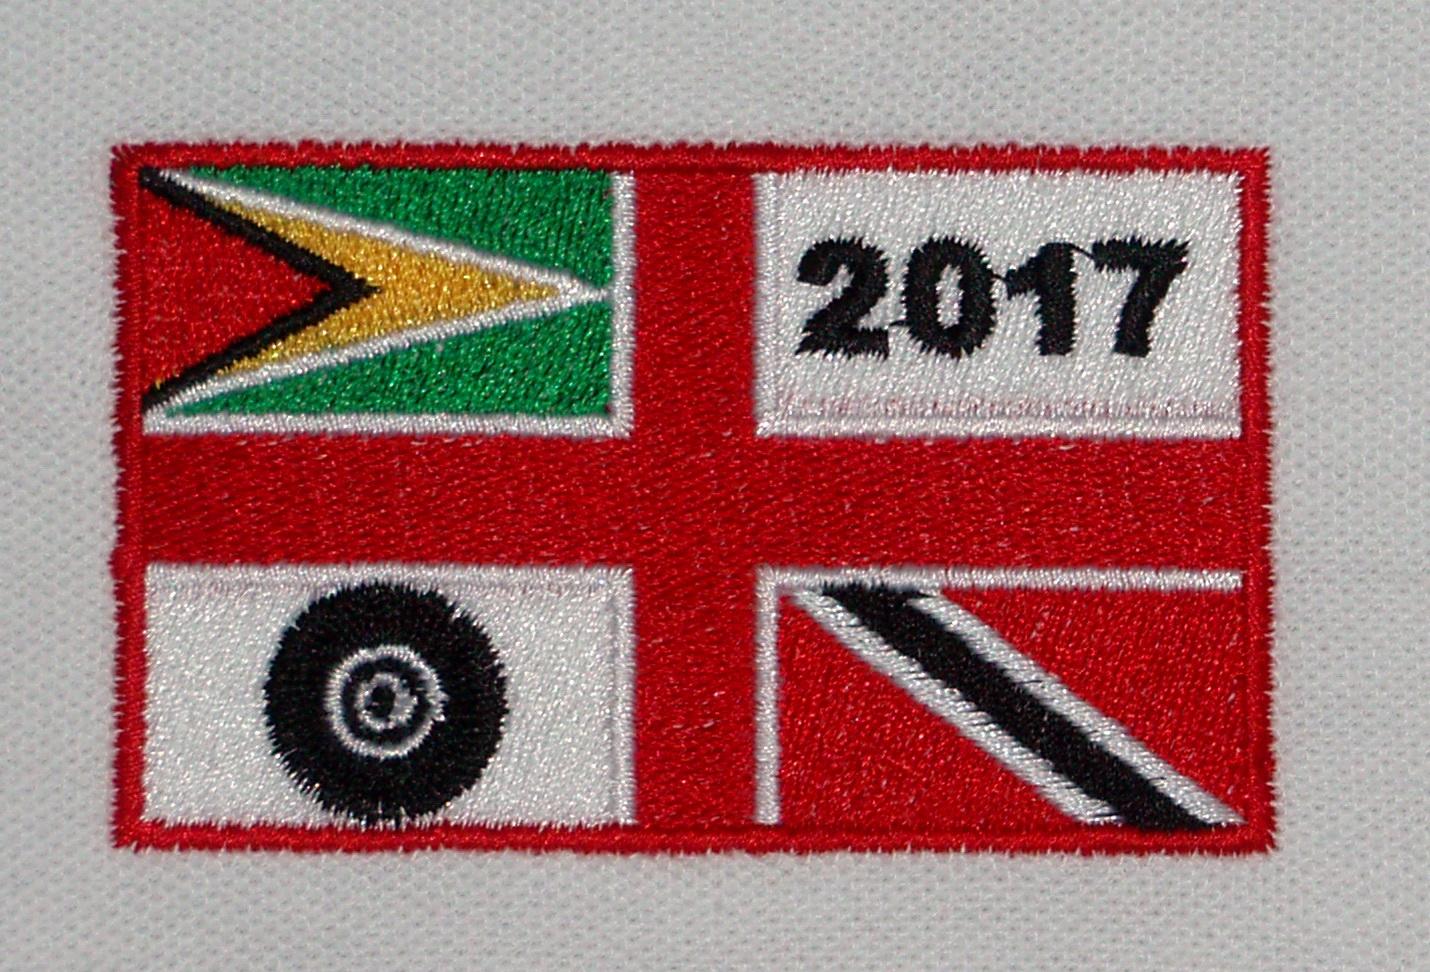 Tour logo for the England Rifle Team